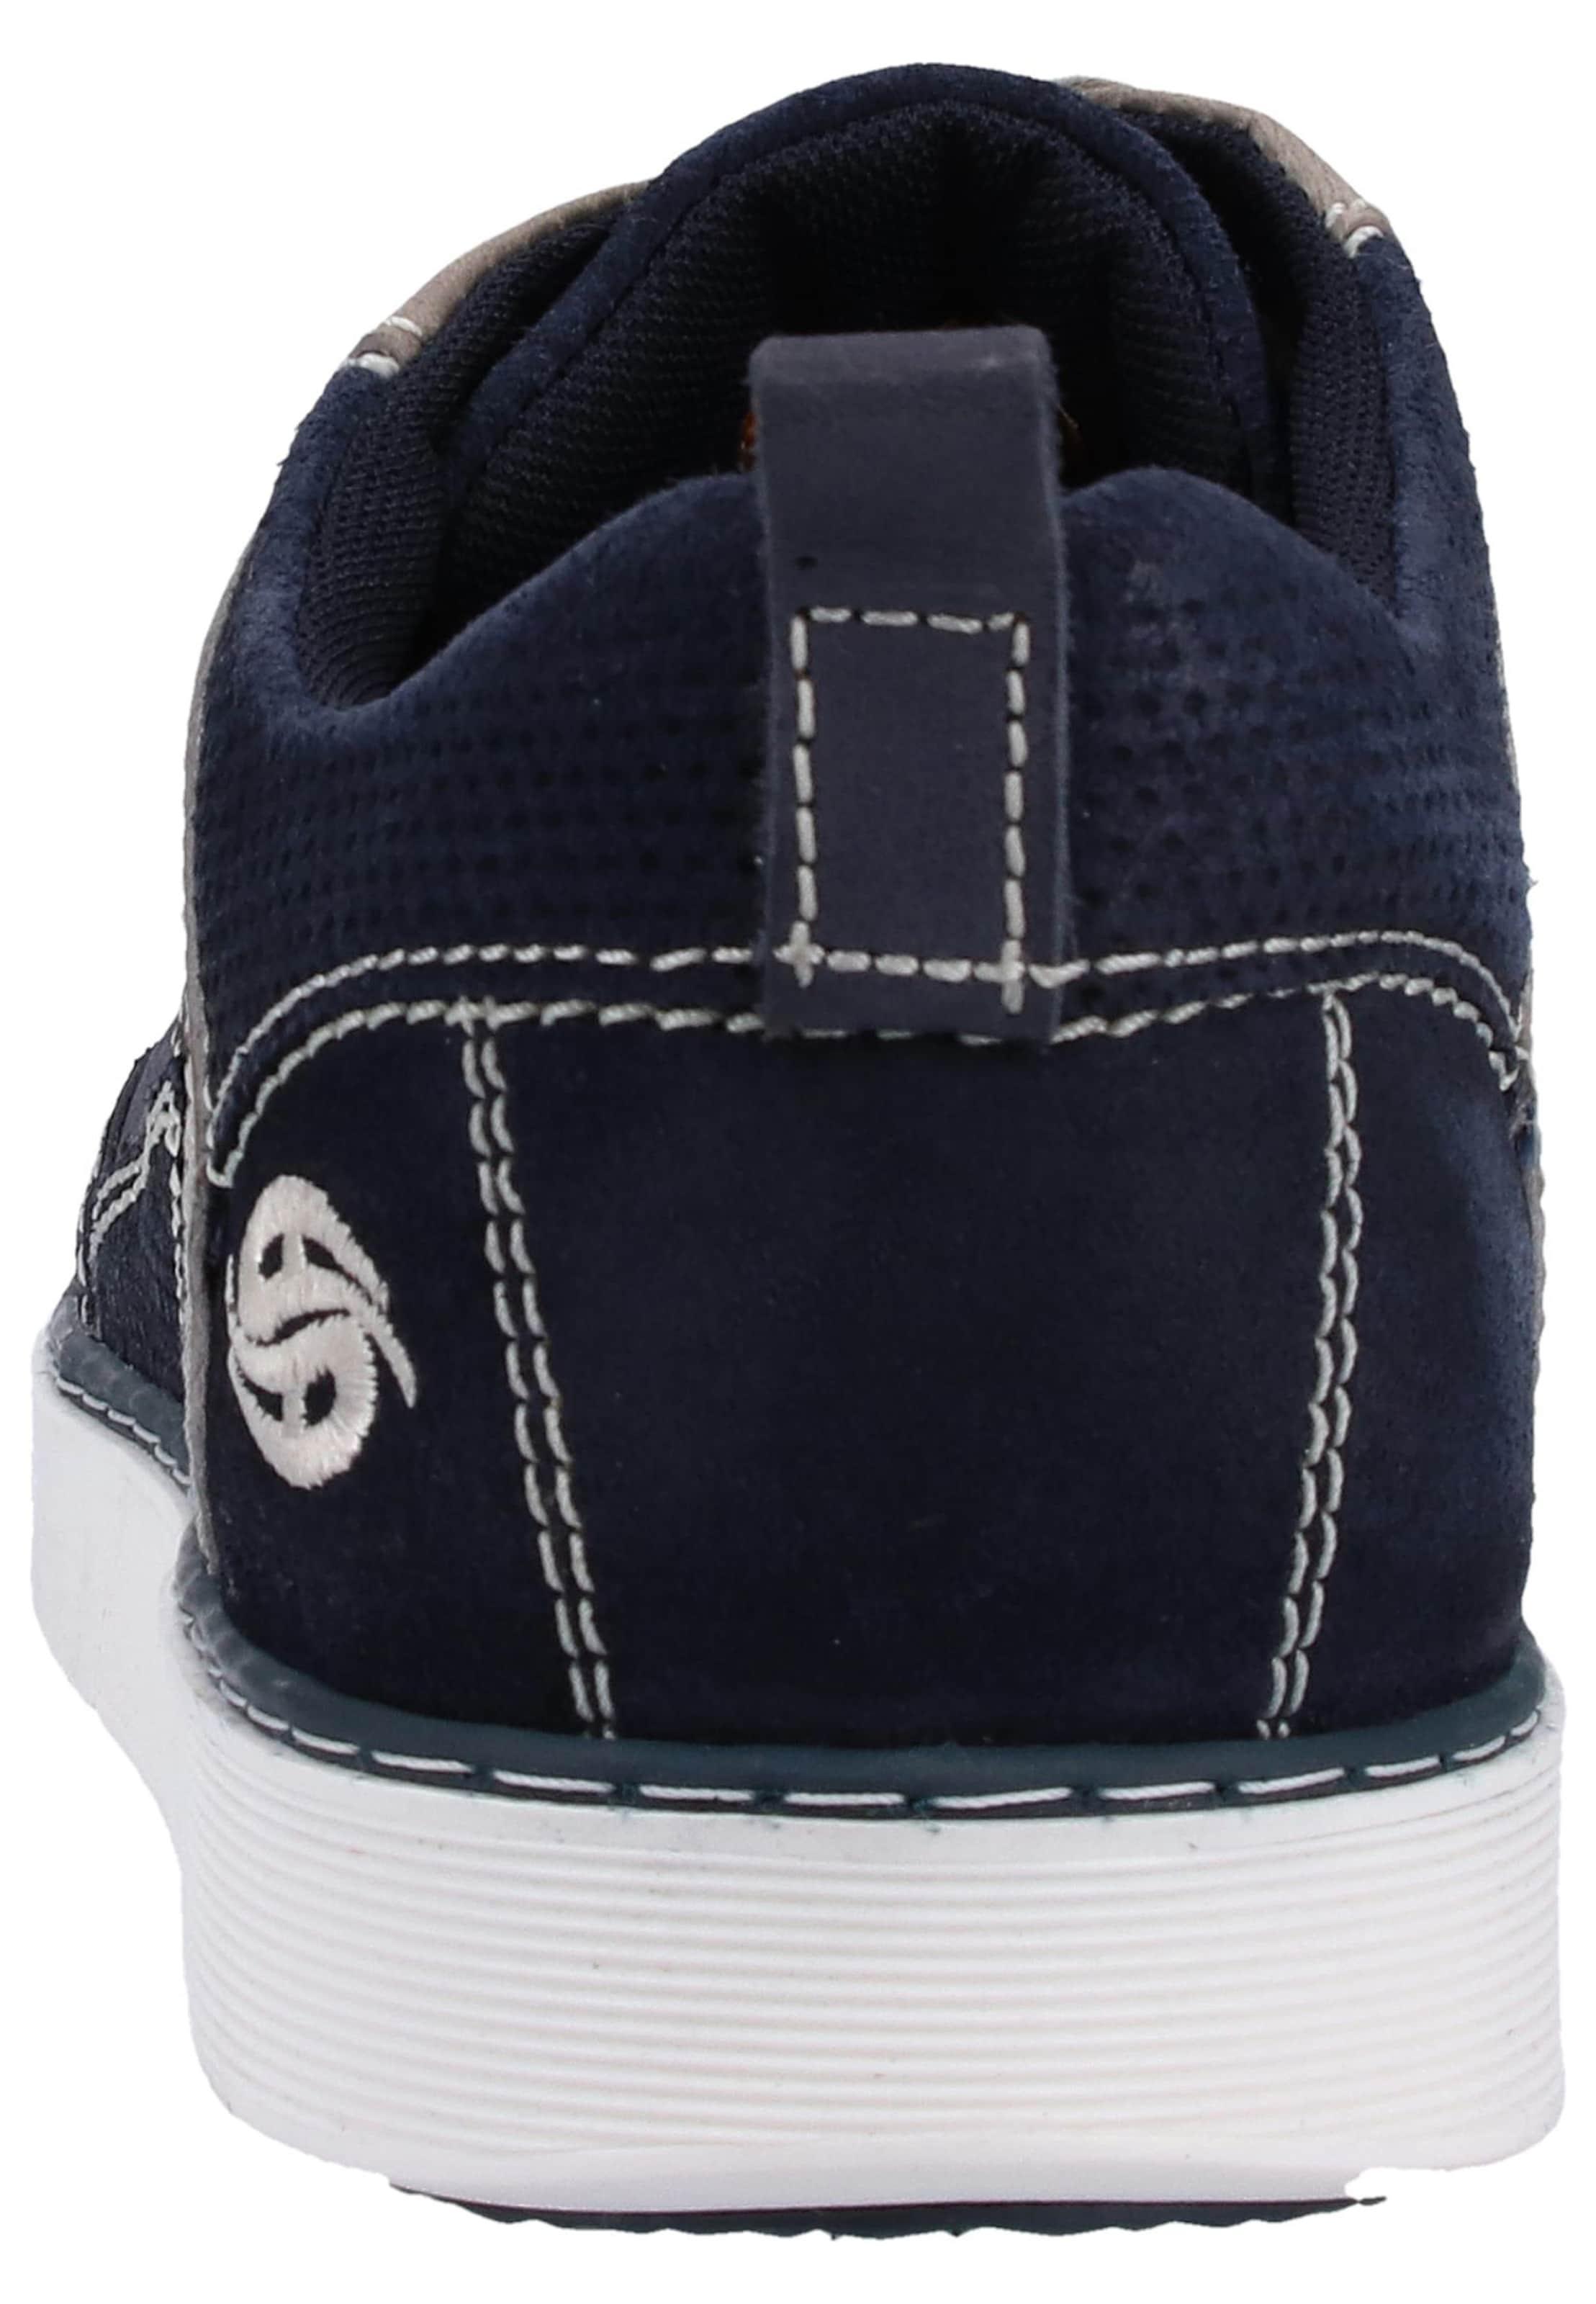 Gerli By DunkelbeigeNavy Sneaker Kastanienbraun In Dockers yOmvN0n8w